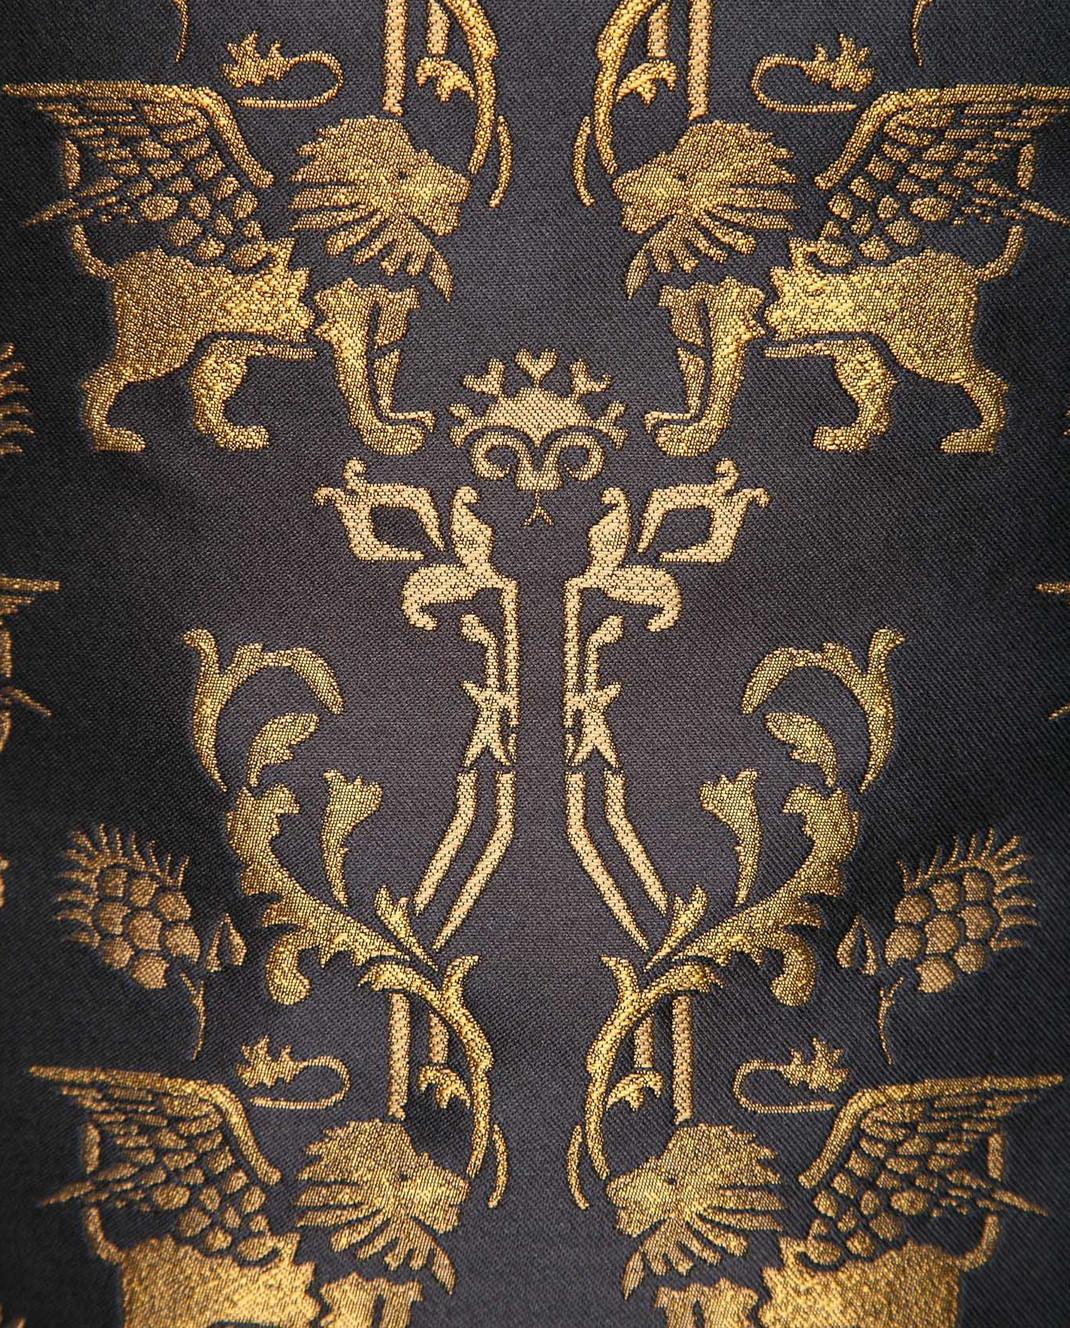 Alberta Ferretti Черное платье Winged lion A0451 изображение 5